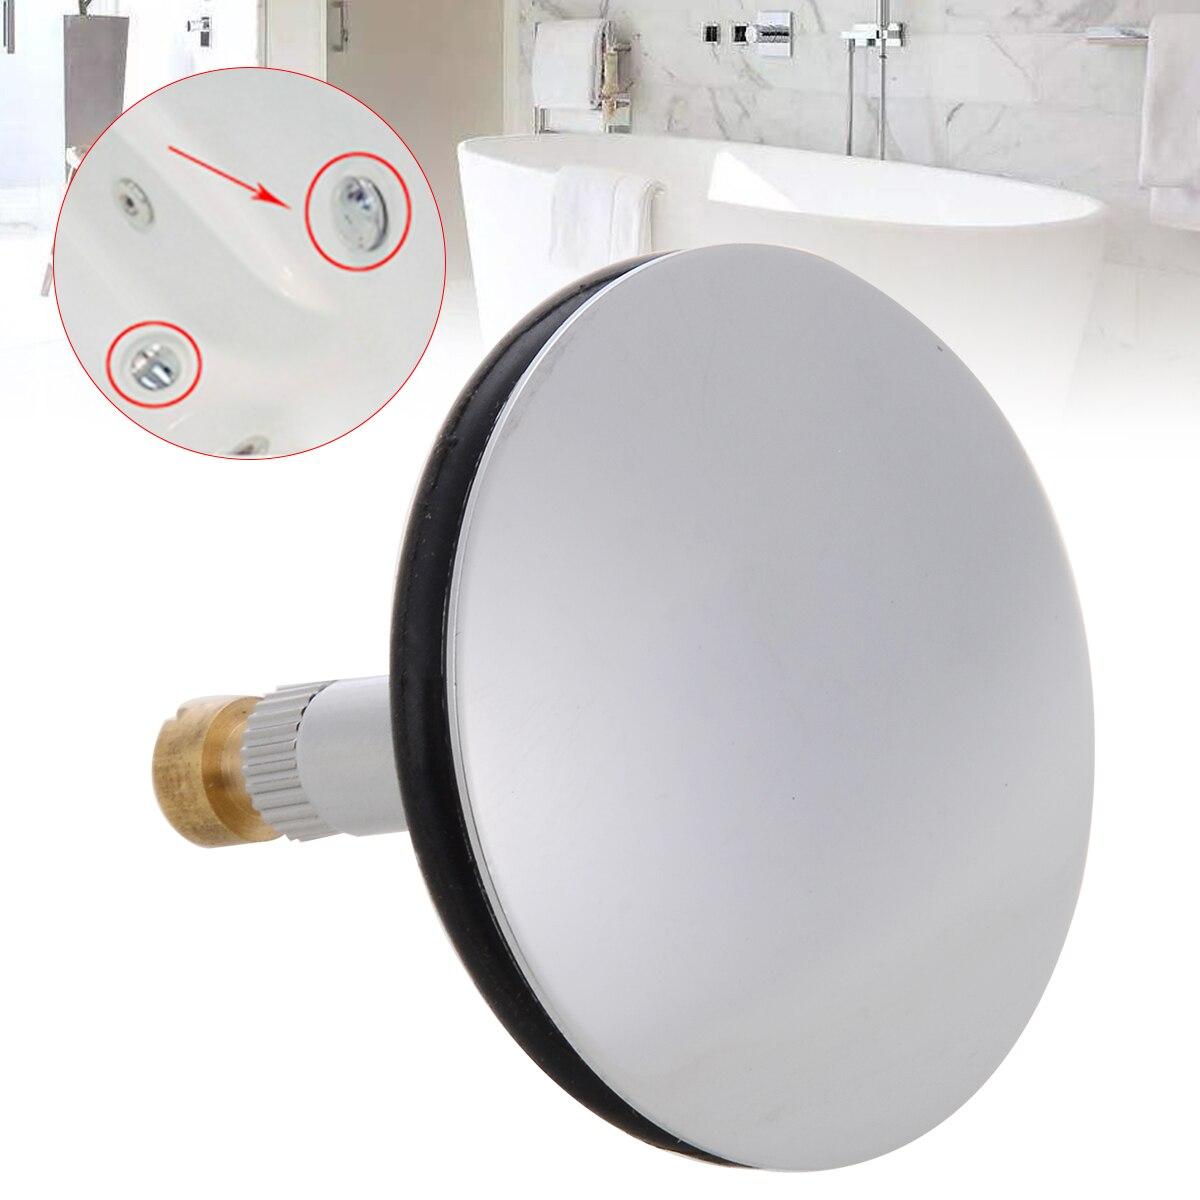 1pc 43mm Brass Bathtub Plug Drain Waste Plug Valve Bathtub Drain Stopper For Bathroom Replacement Accessories